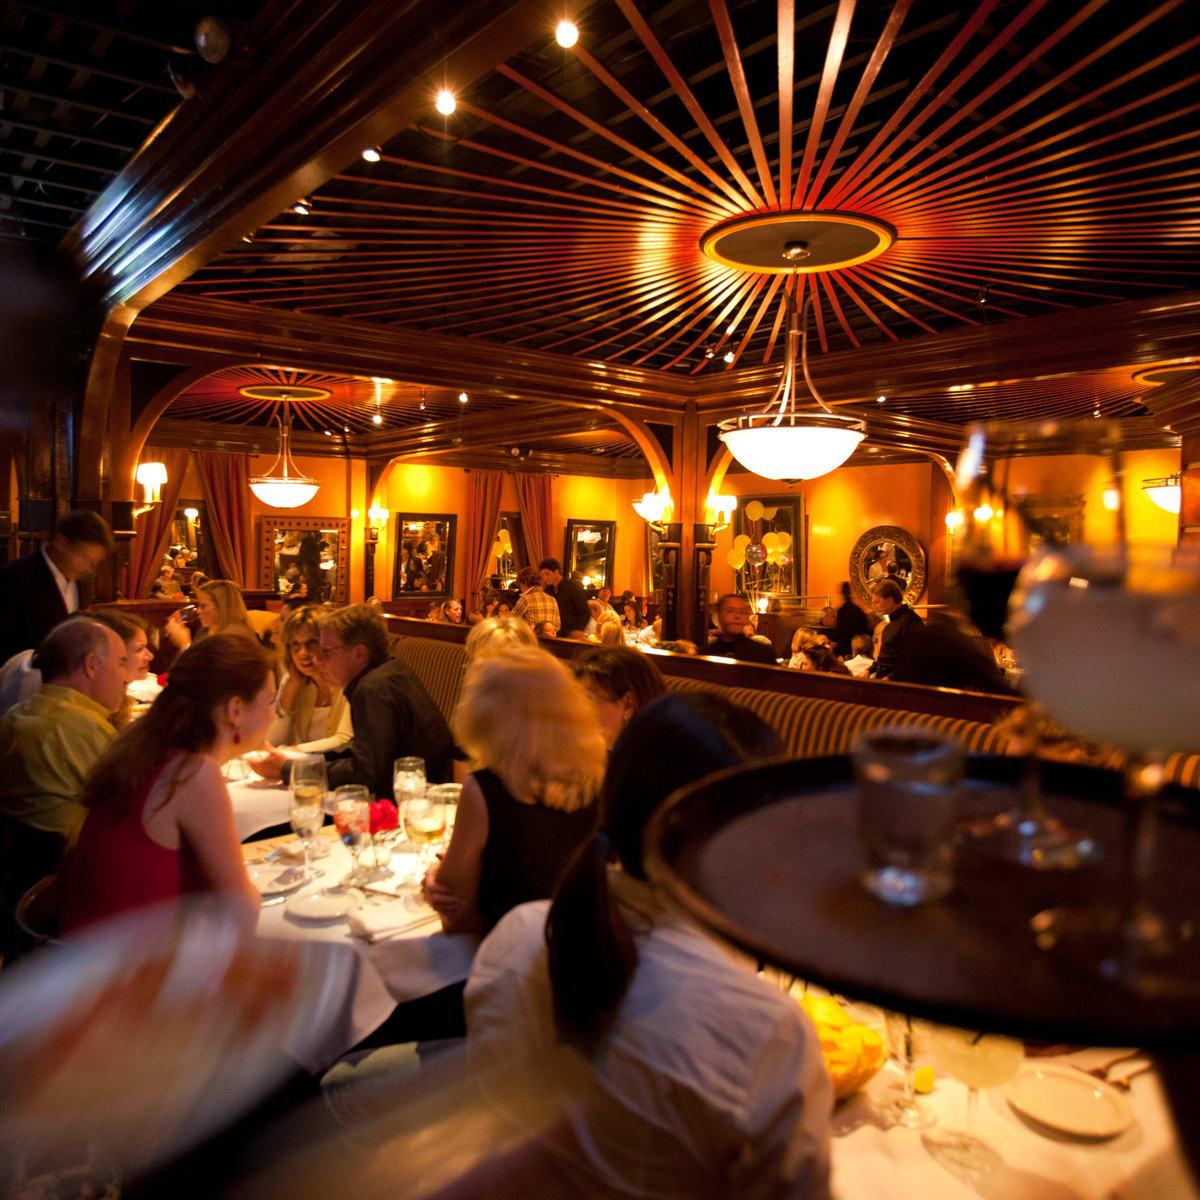 Armandos of Houston interior dining room with people_January 2014